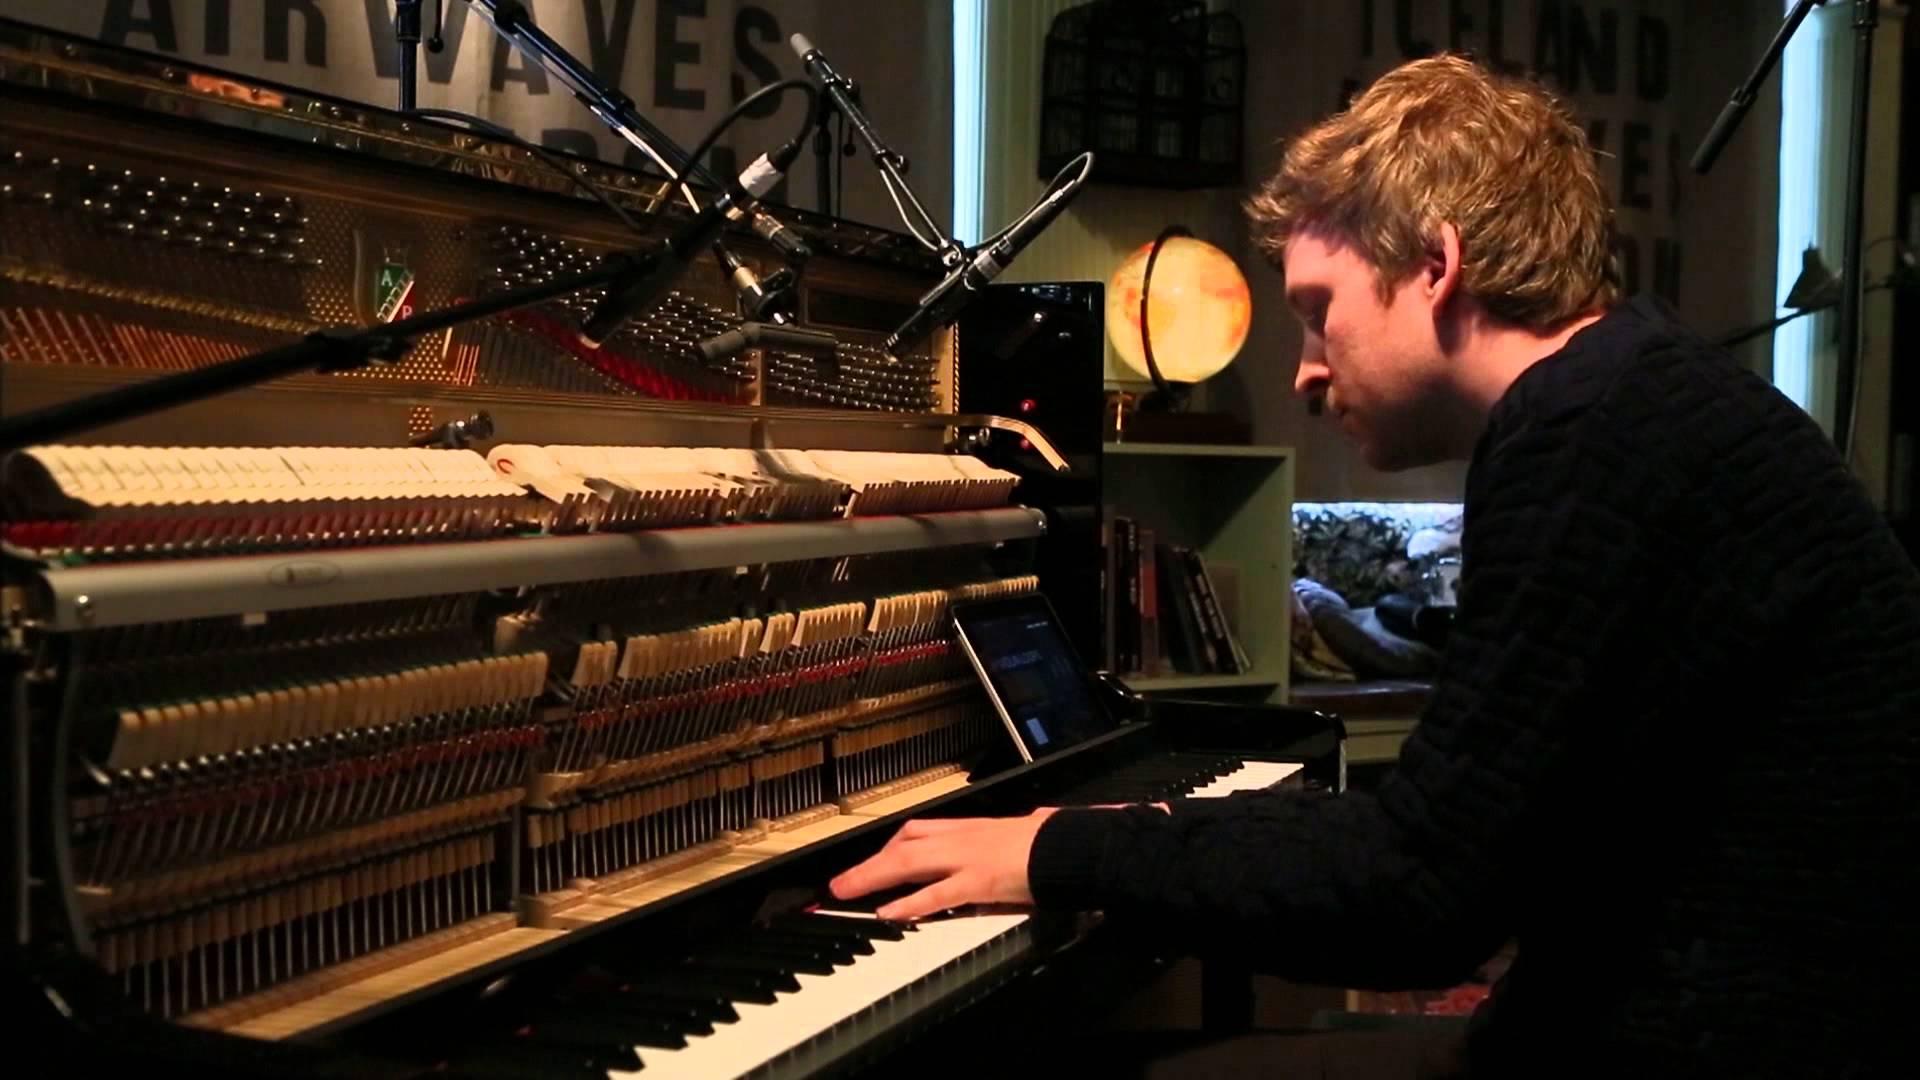 Happy Piano Day, from Ólafur Arnalds!